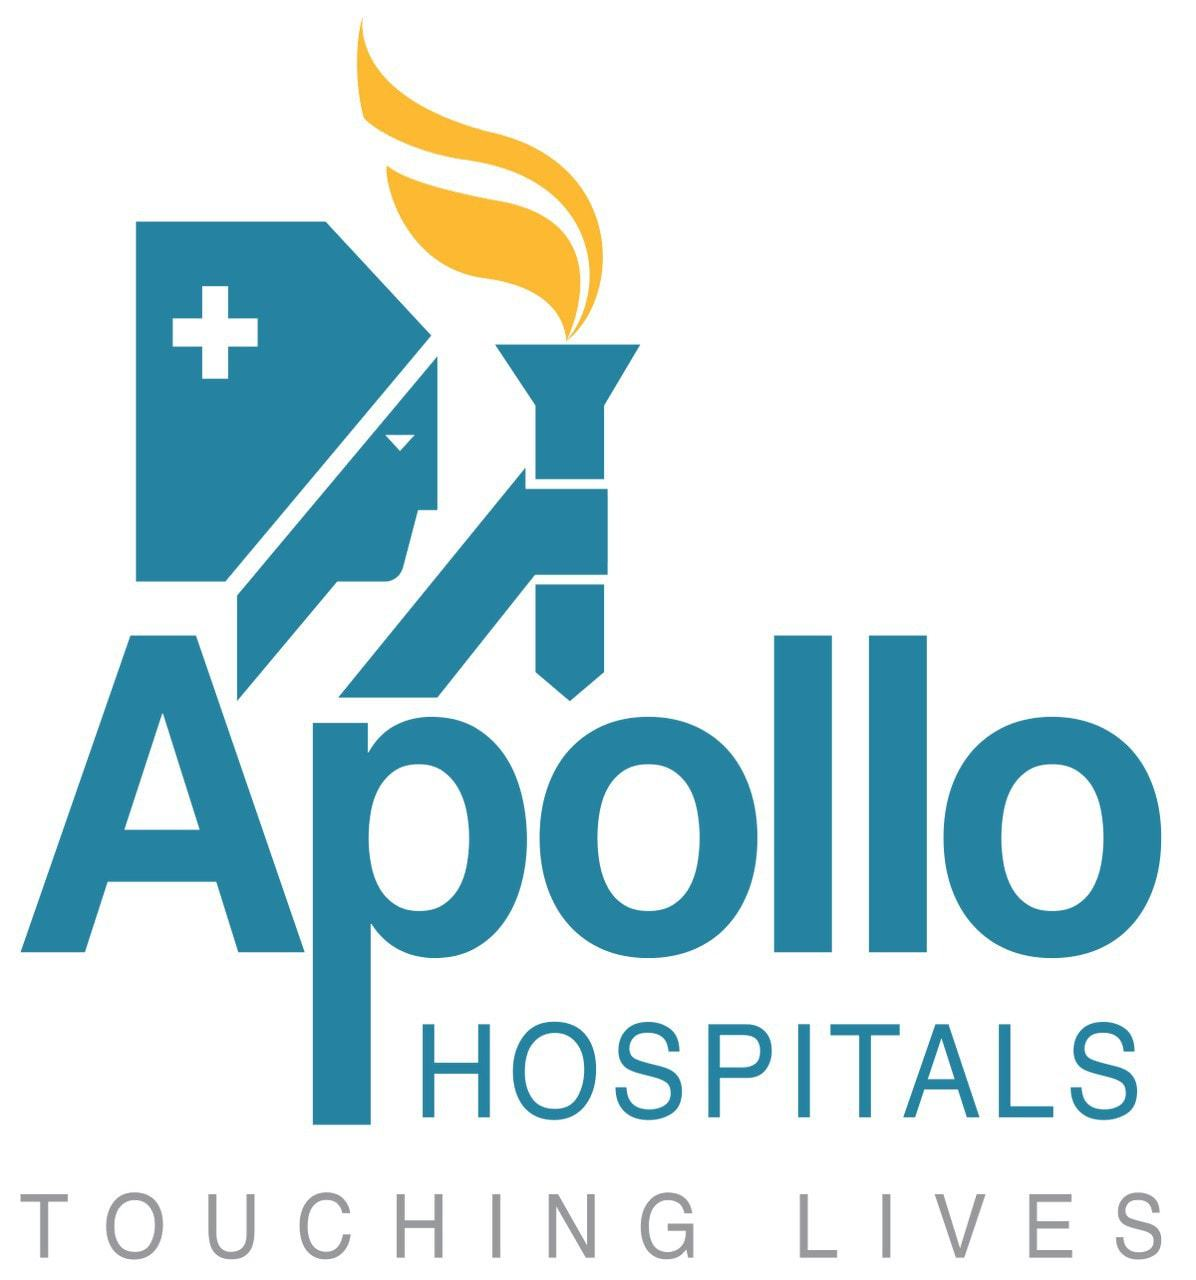 SWOT analysis of Apollo Hospitals - 3